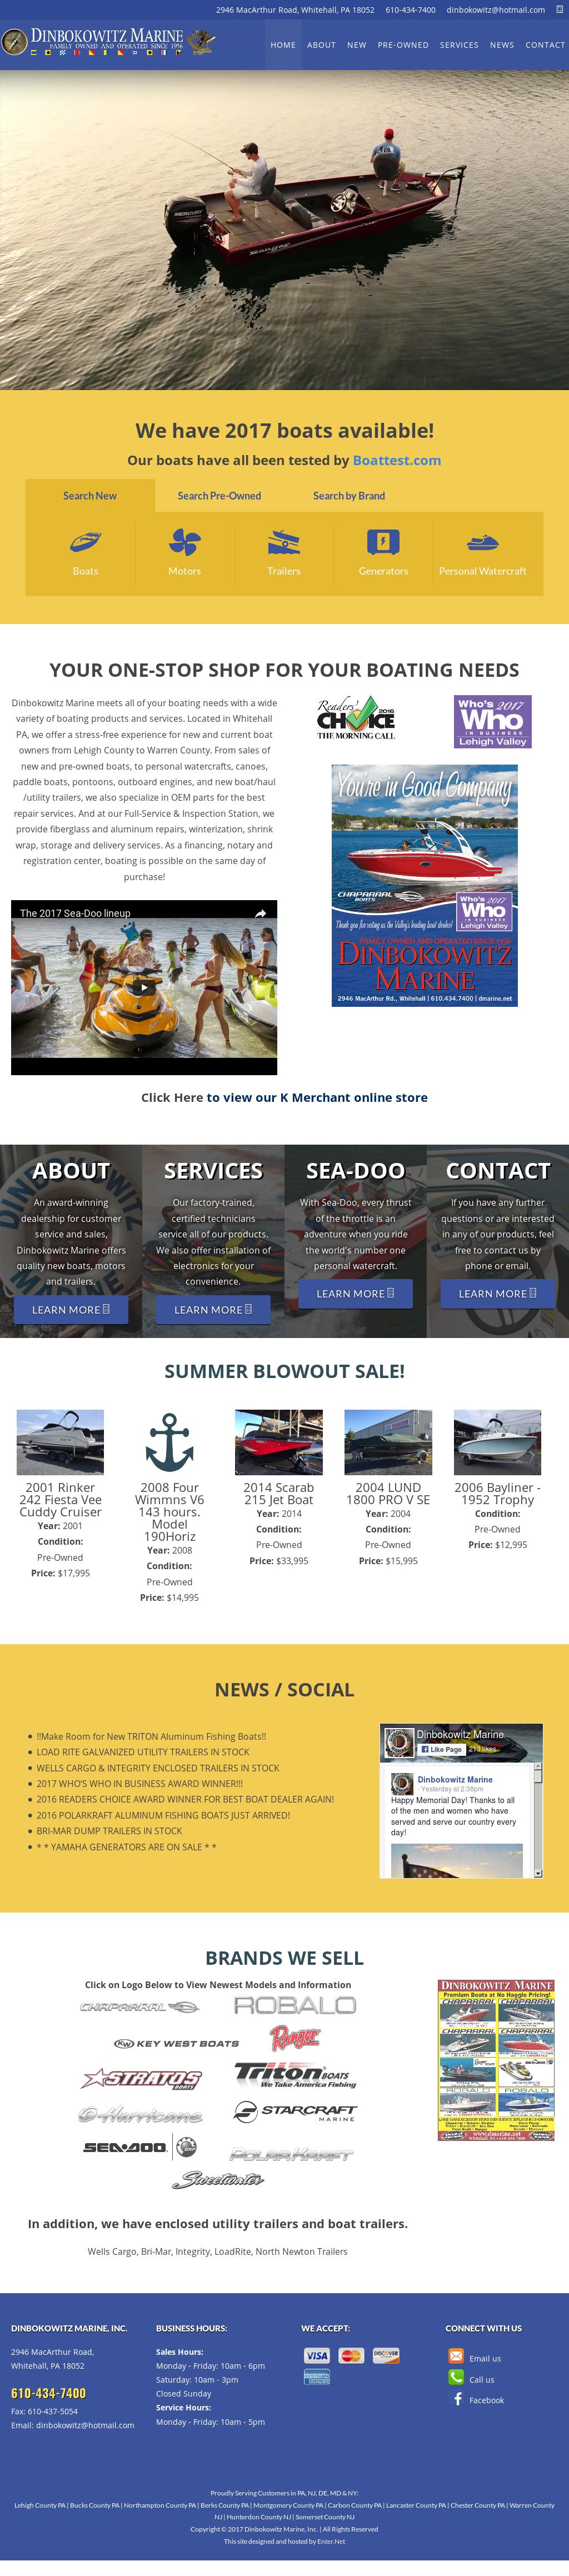 Dinbokowitz Marine Competitors, Revenue and Employees